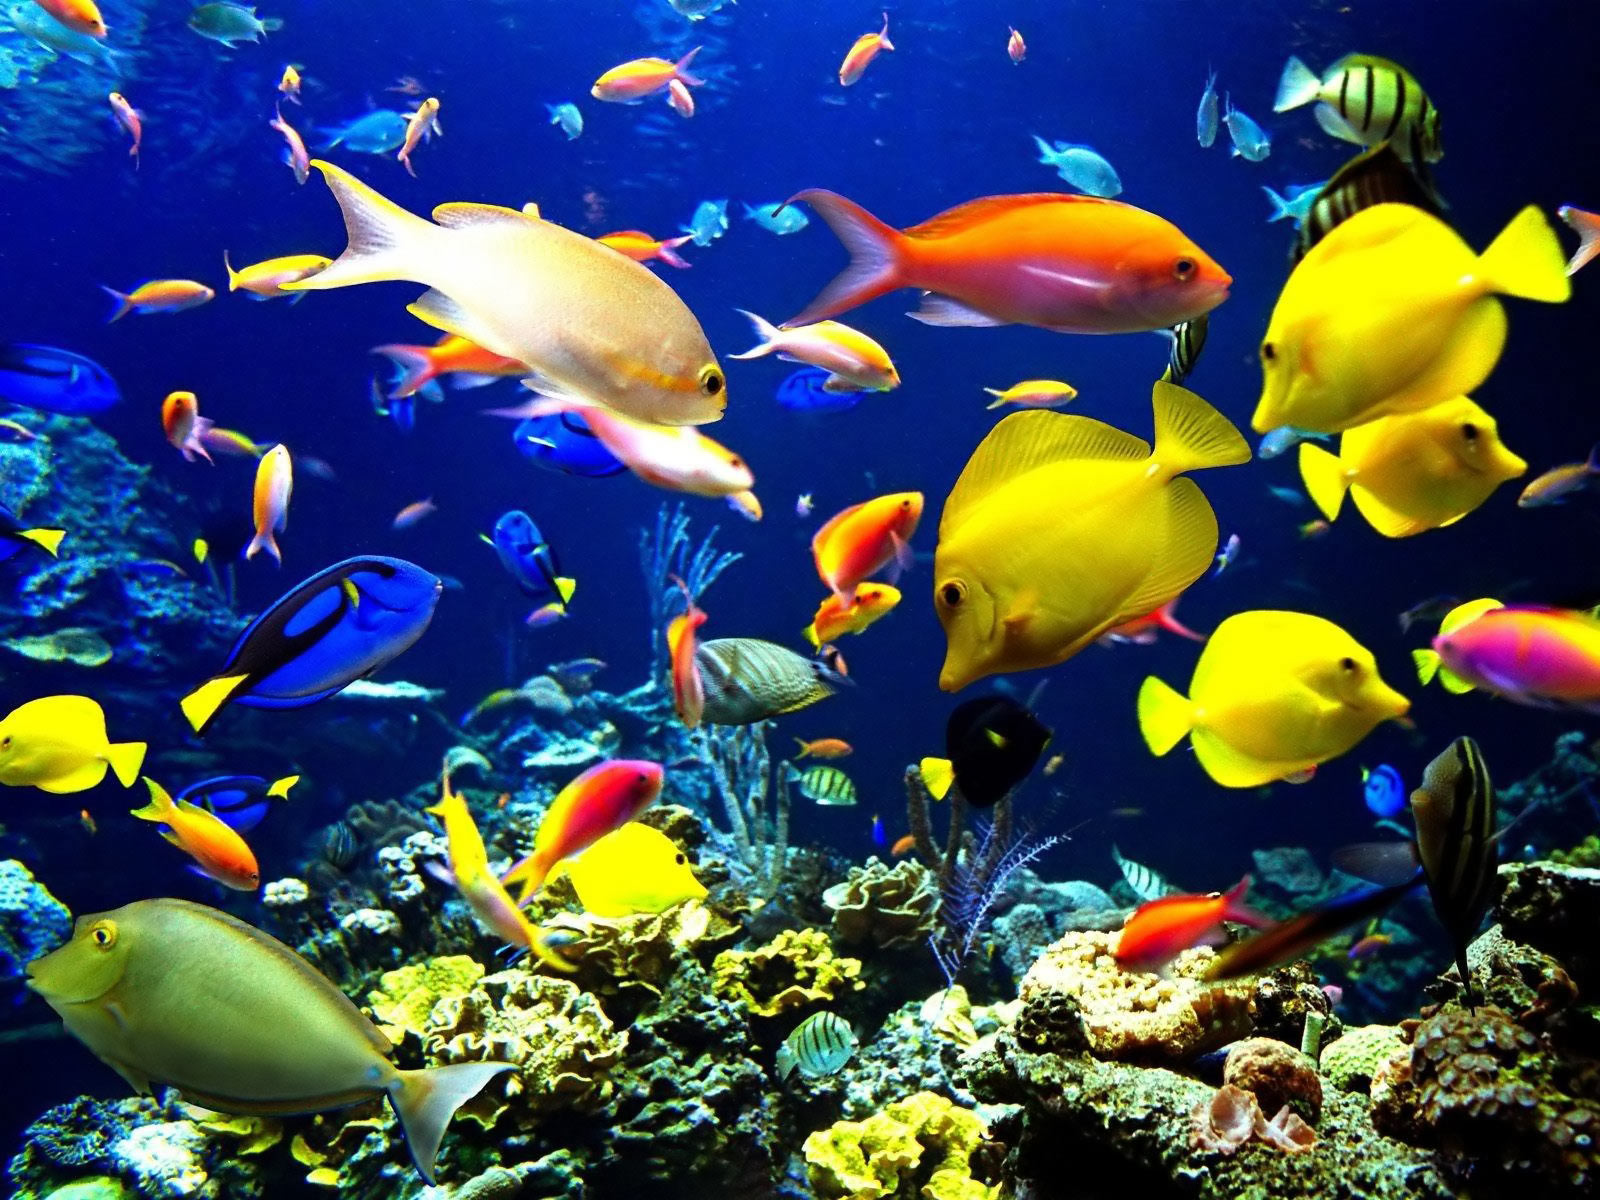 Android Live Wallpaper live fish wallpaper 1600x1200